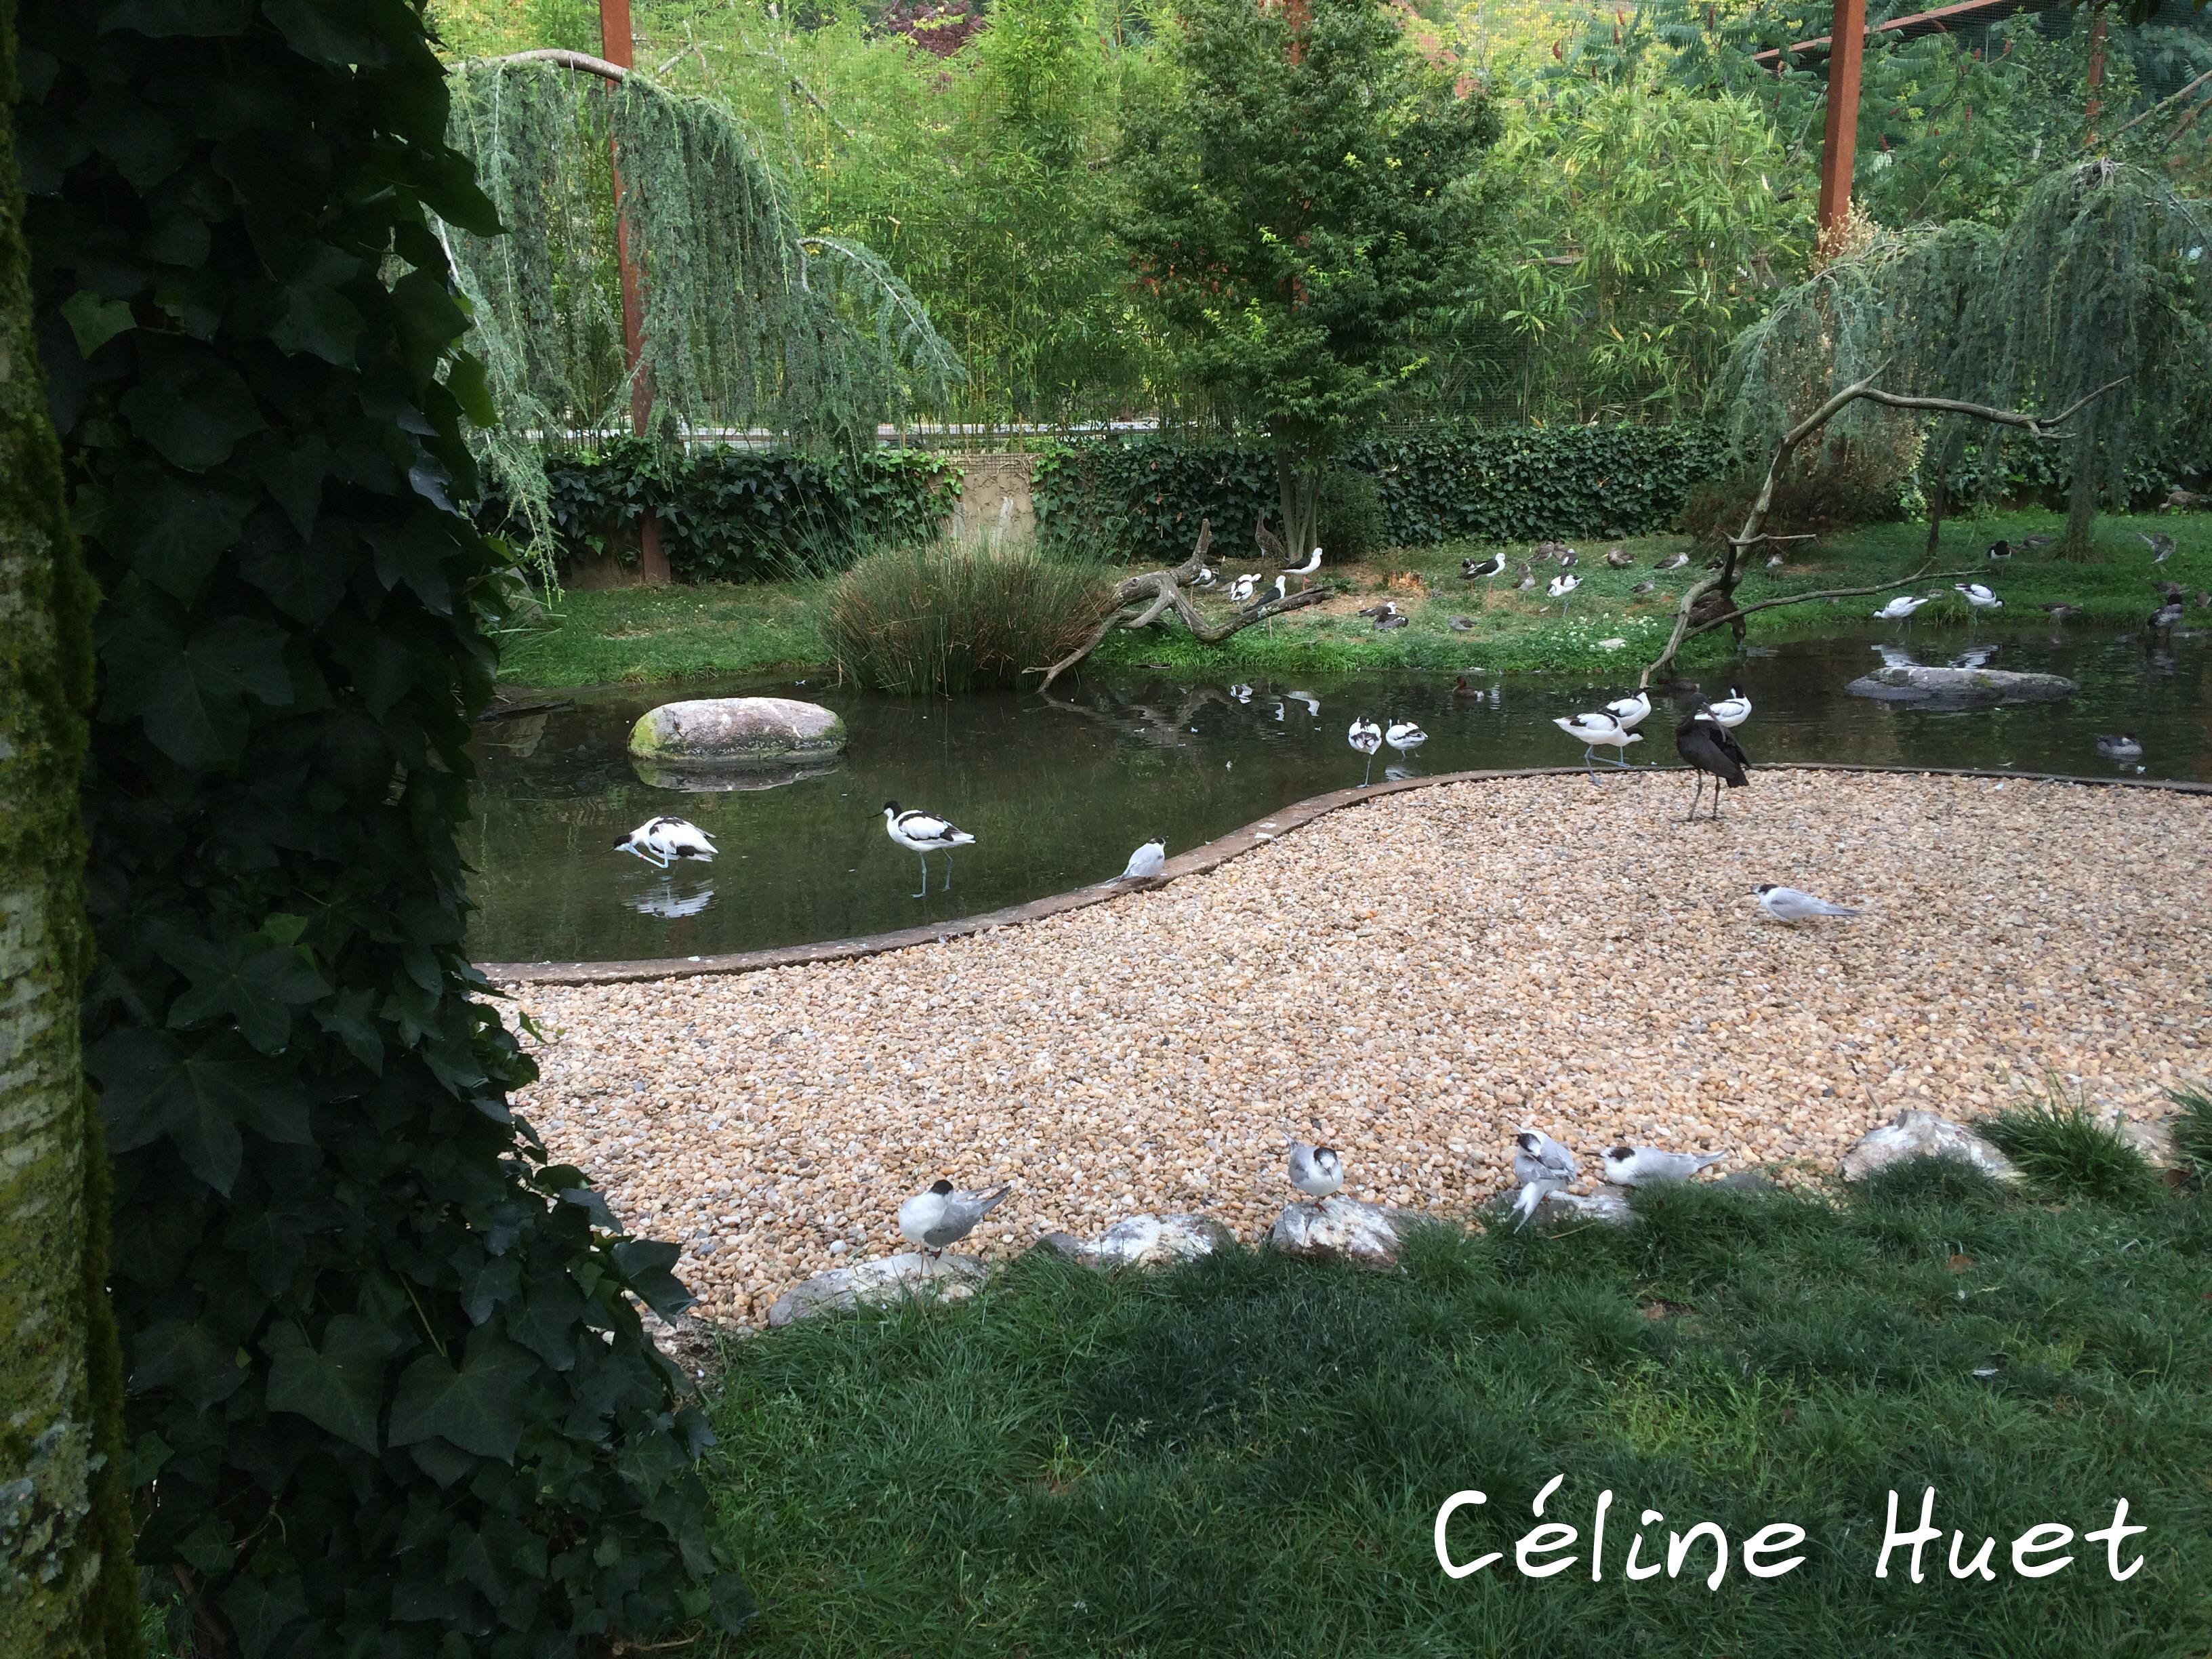 Parc animalier Argelès-Gazost Pyrénées France